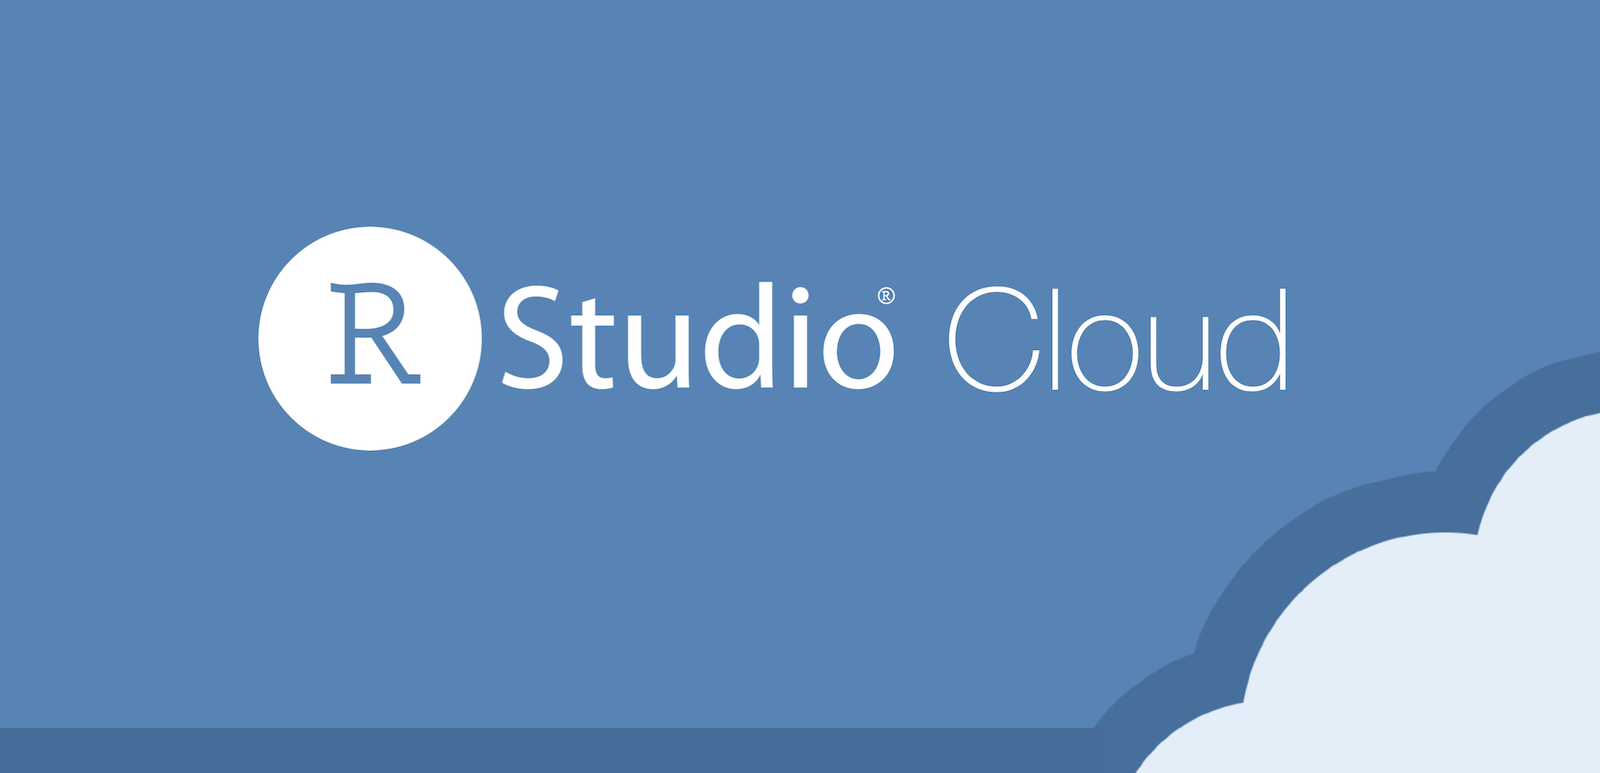 RStudio Cloud logo